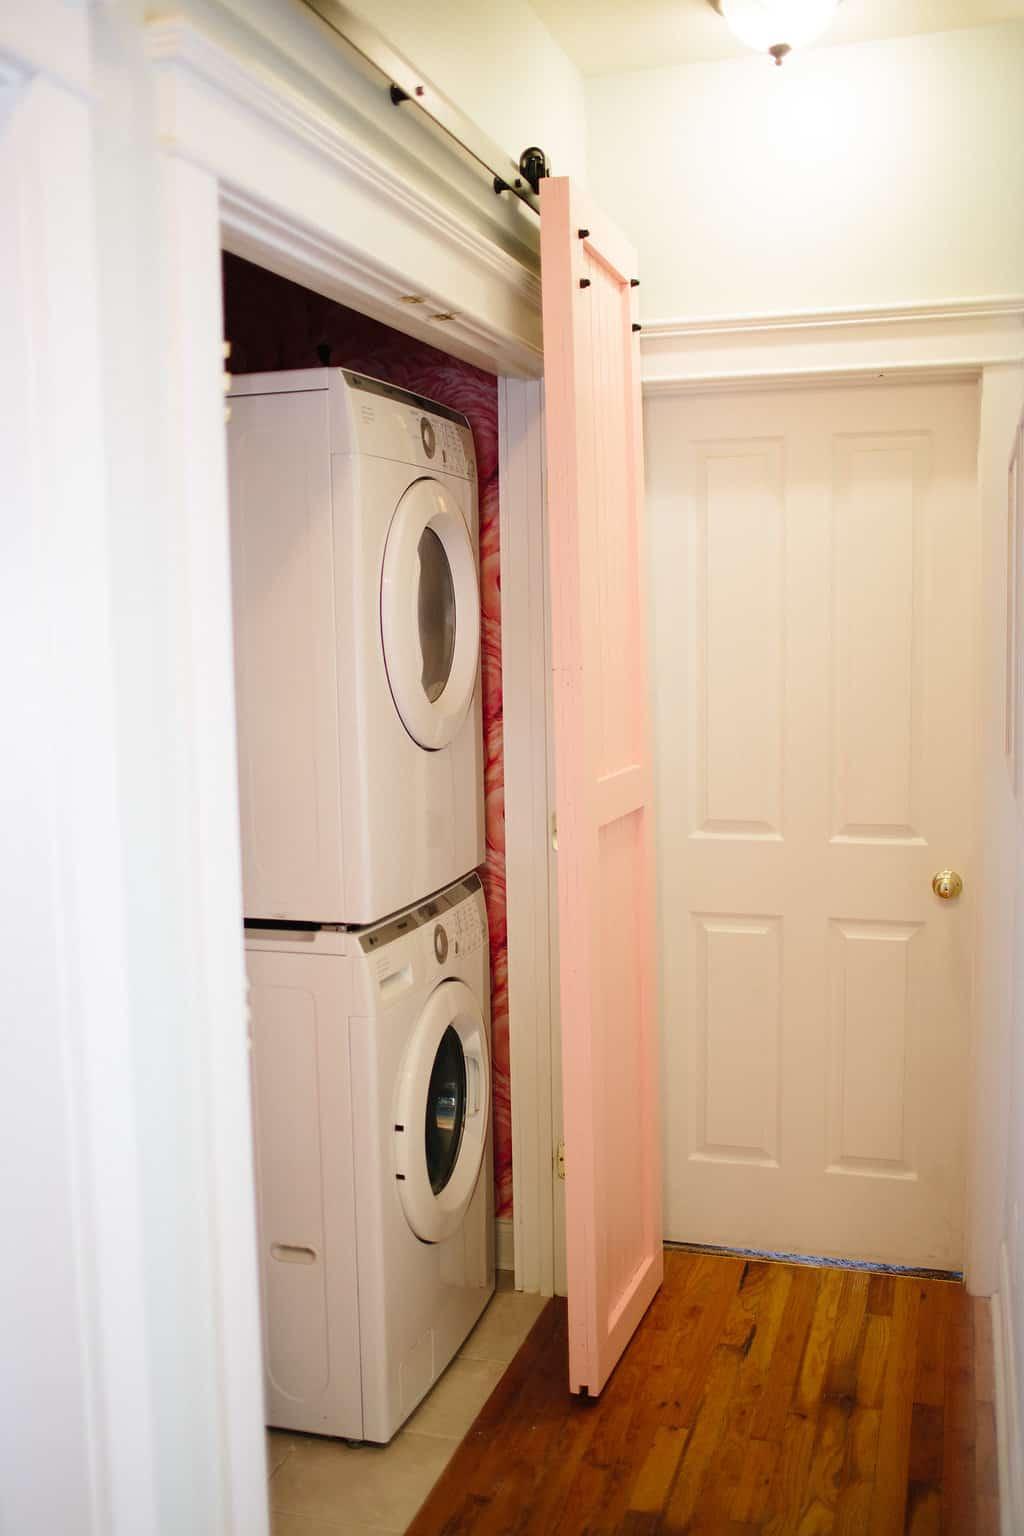 One Room Challenge Week 6: Laundry Room Reveal